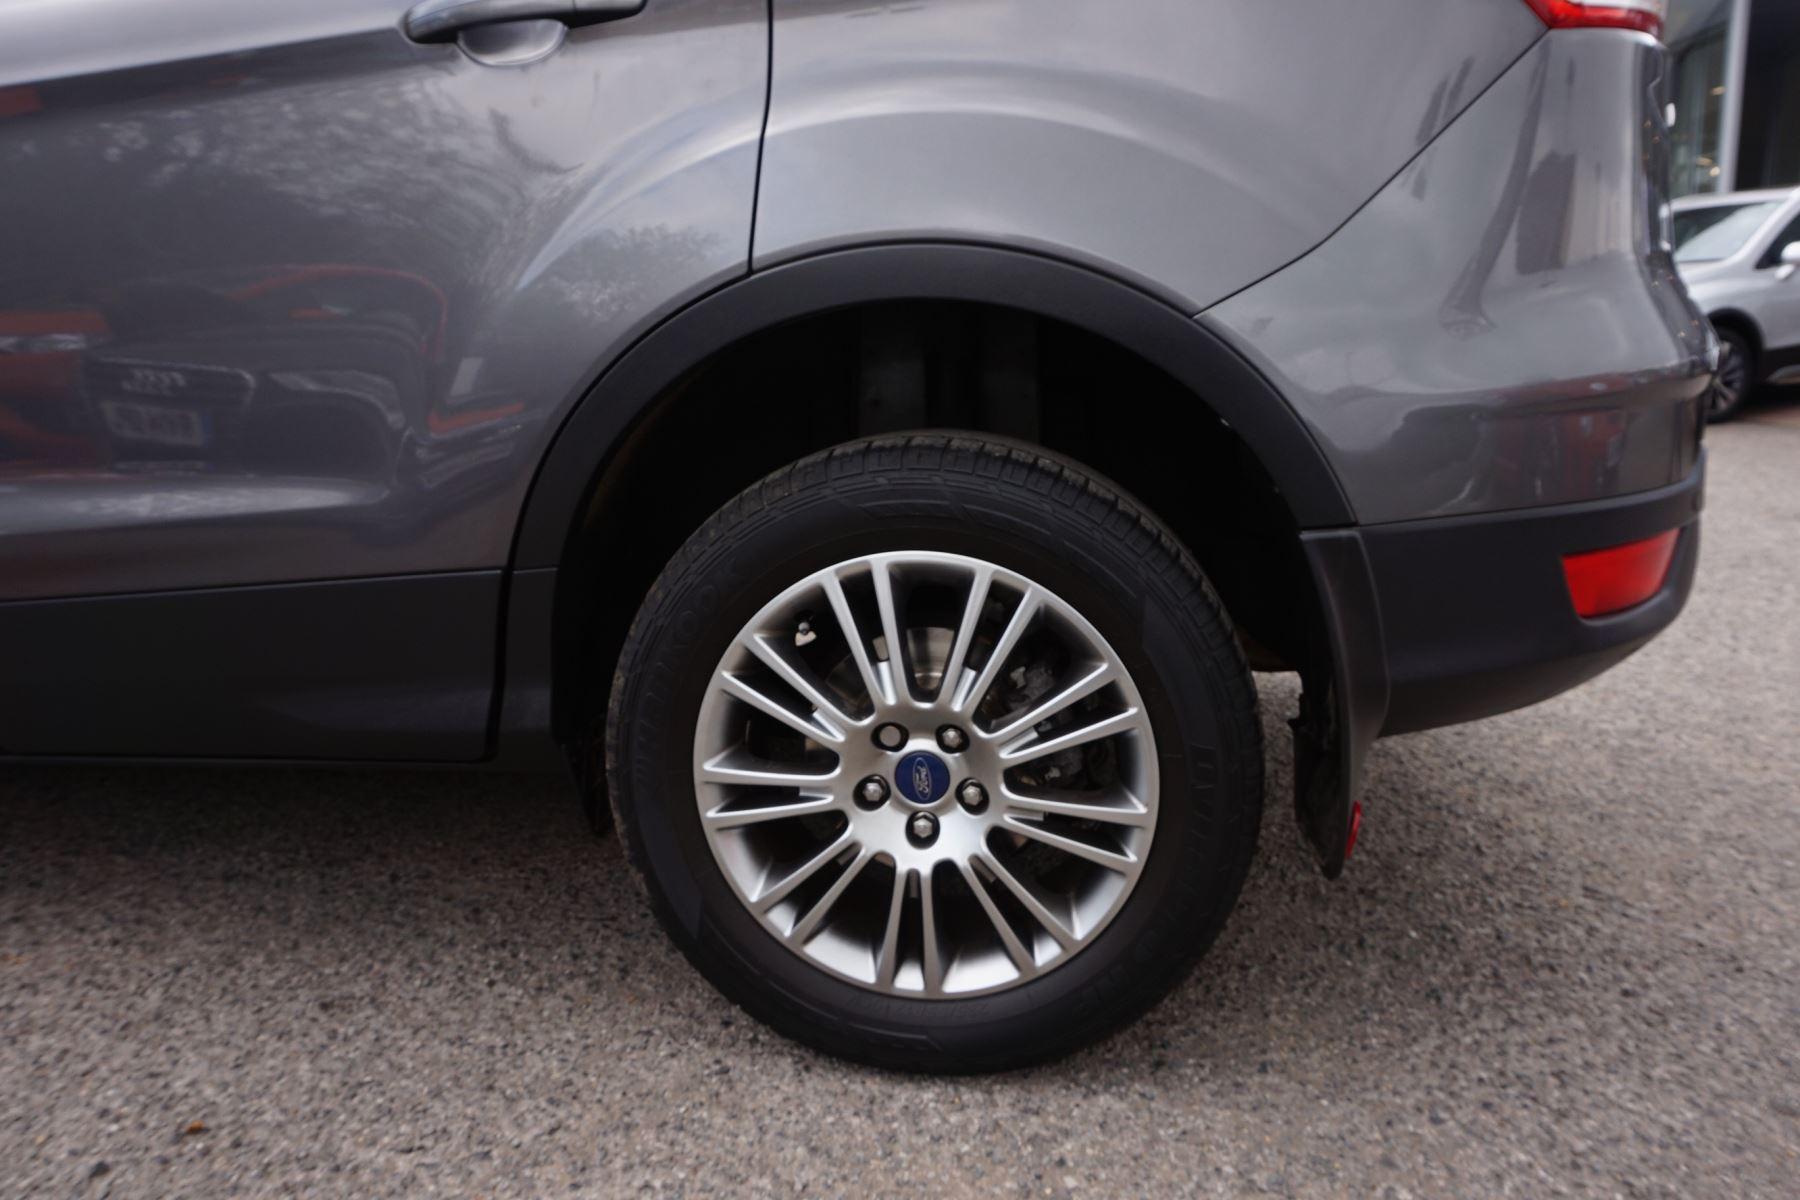 Ford Kuga 2.0 TDCi Titanium 2WD image 7